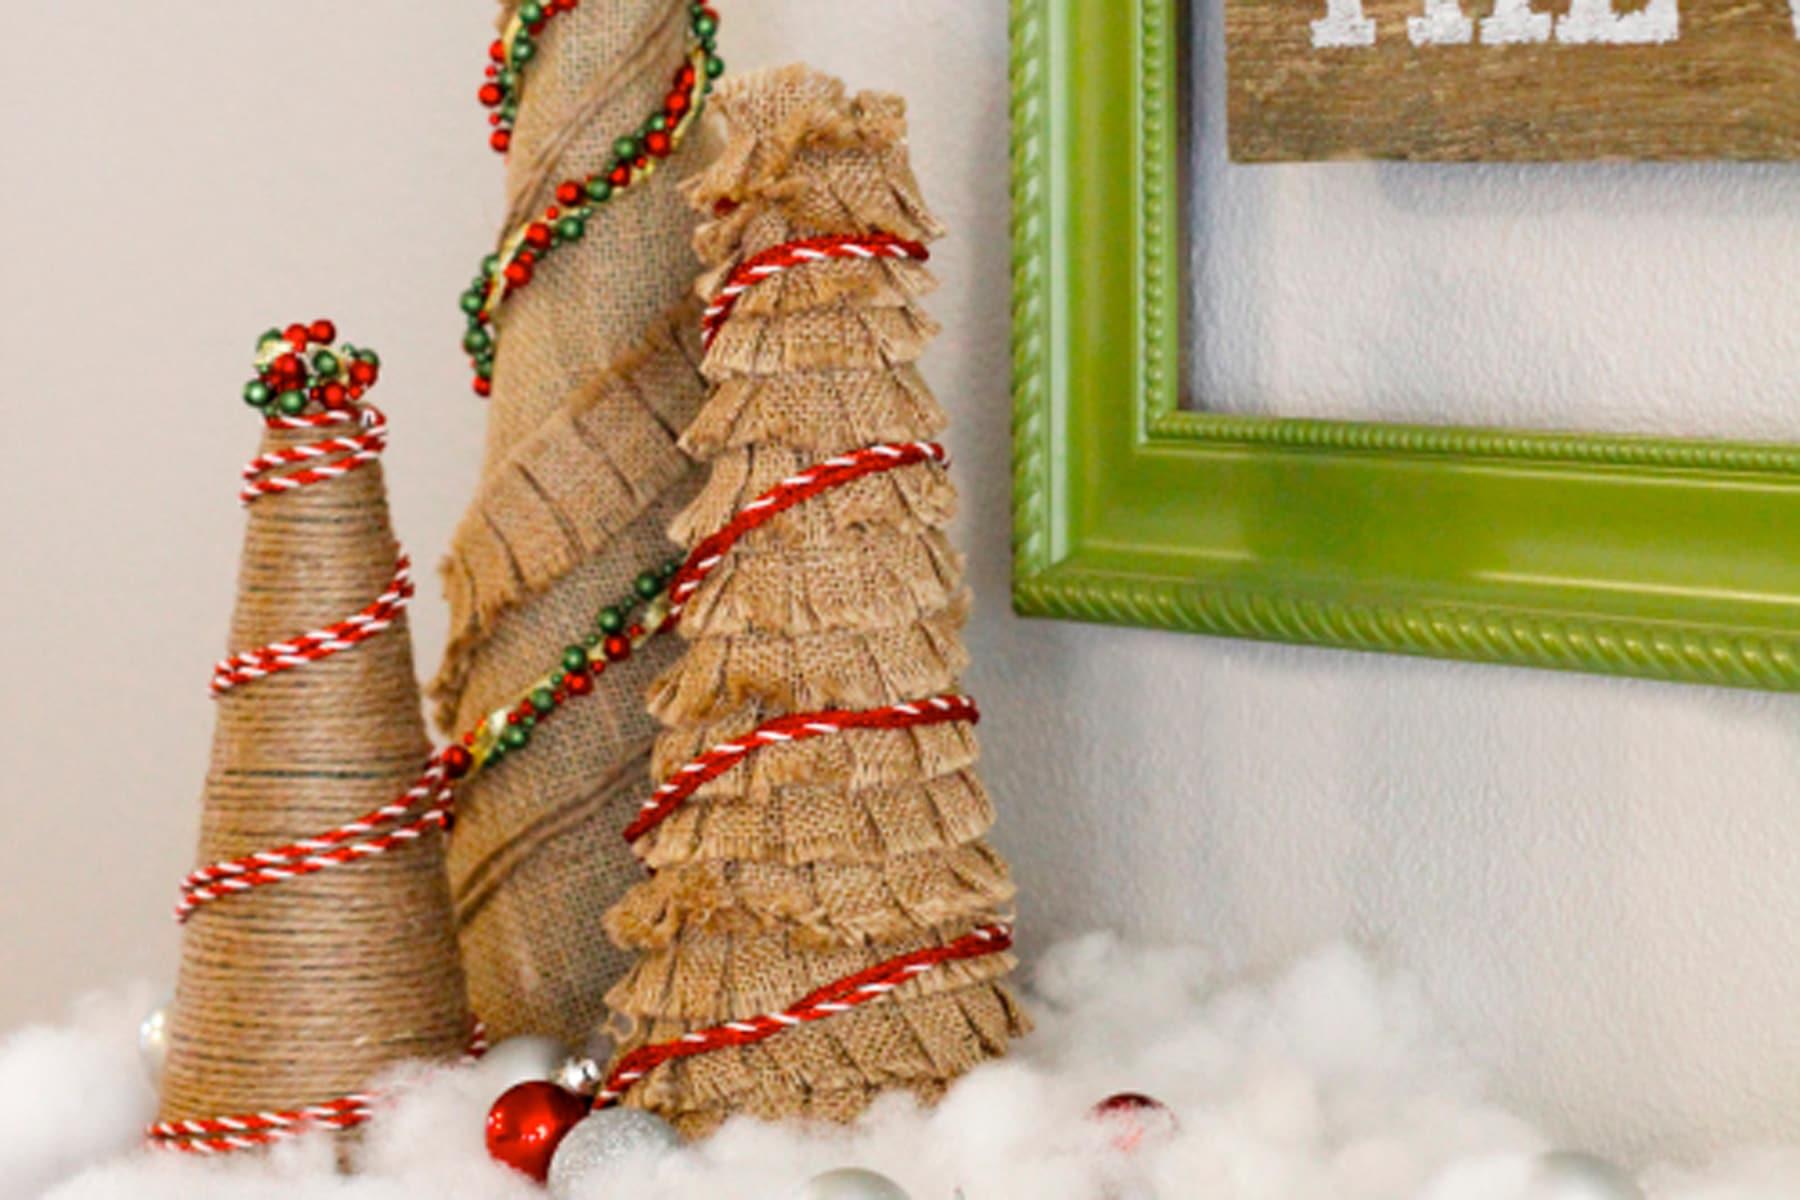 How to Make Burlap Christmas Trees